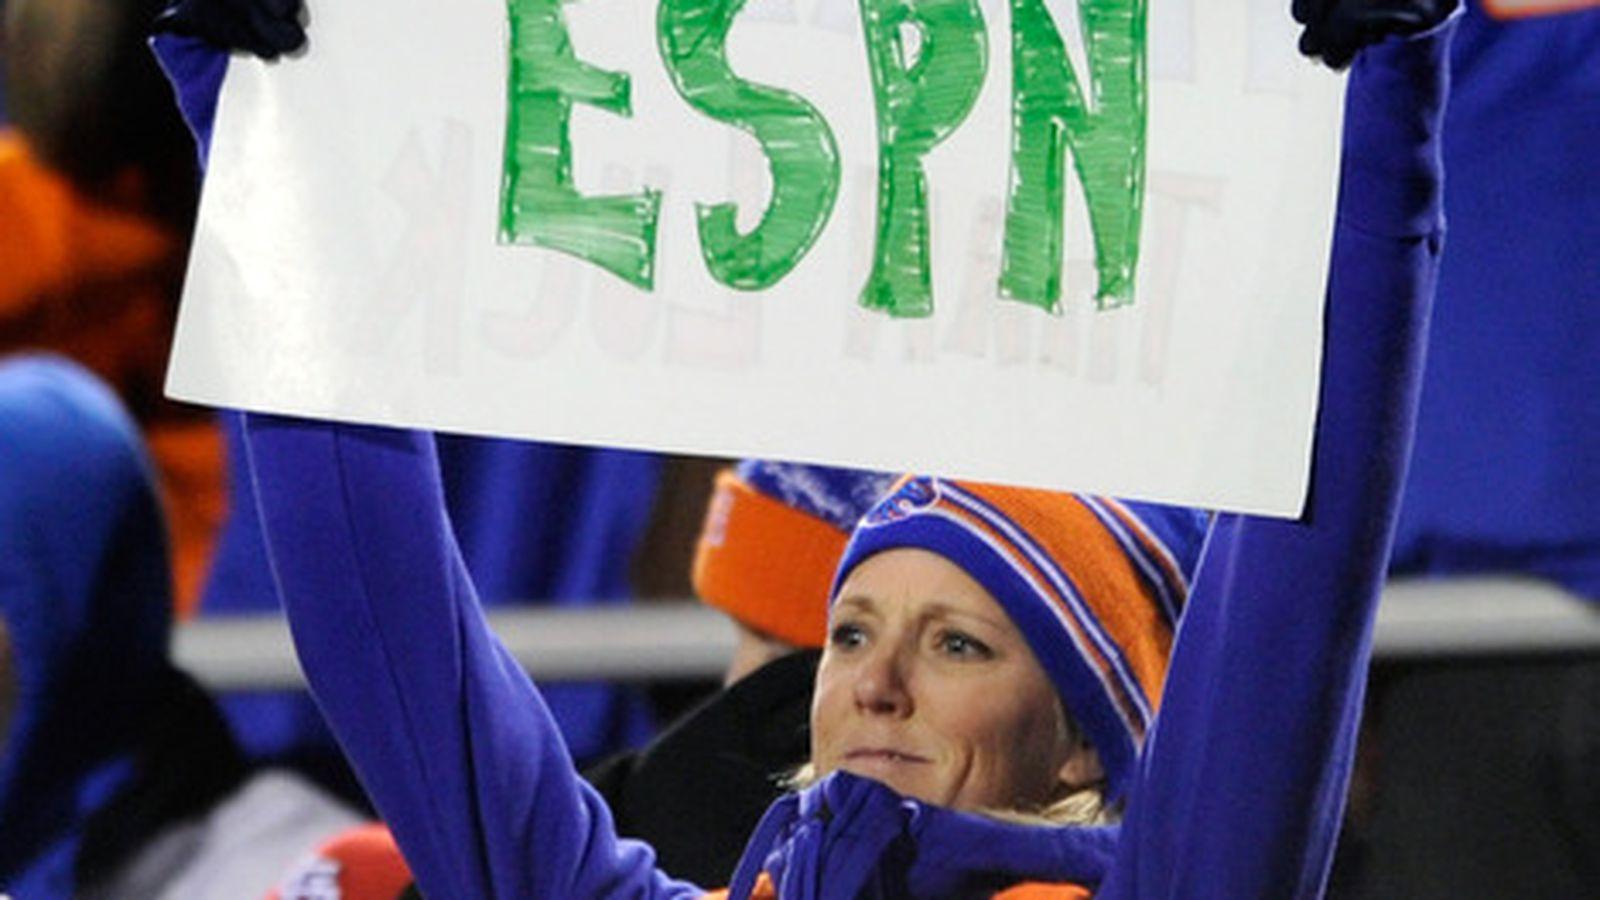 ESPN无视曲棍球死亡,将曲棍球社区拉近一起